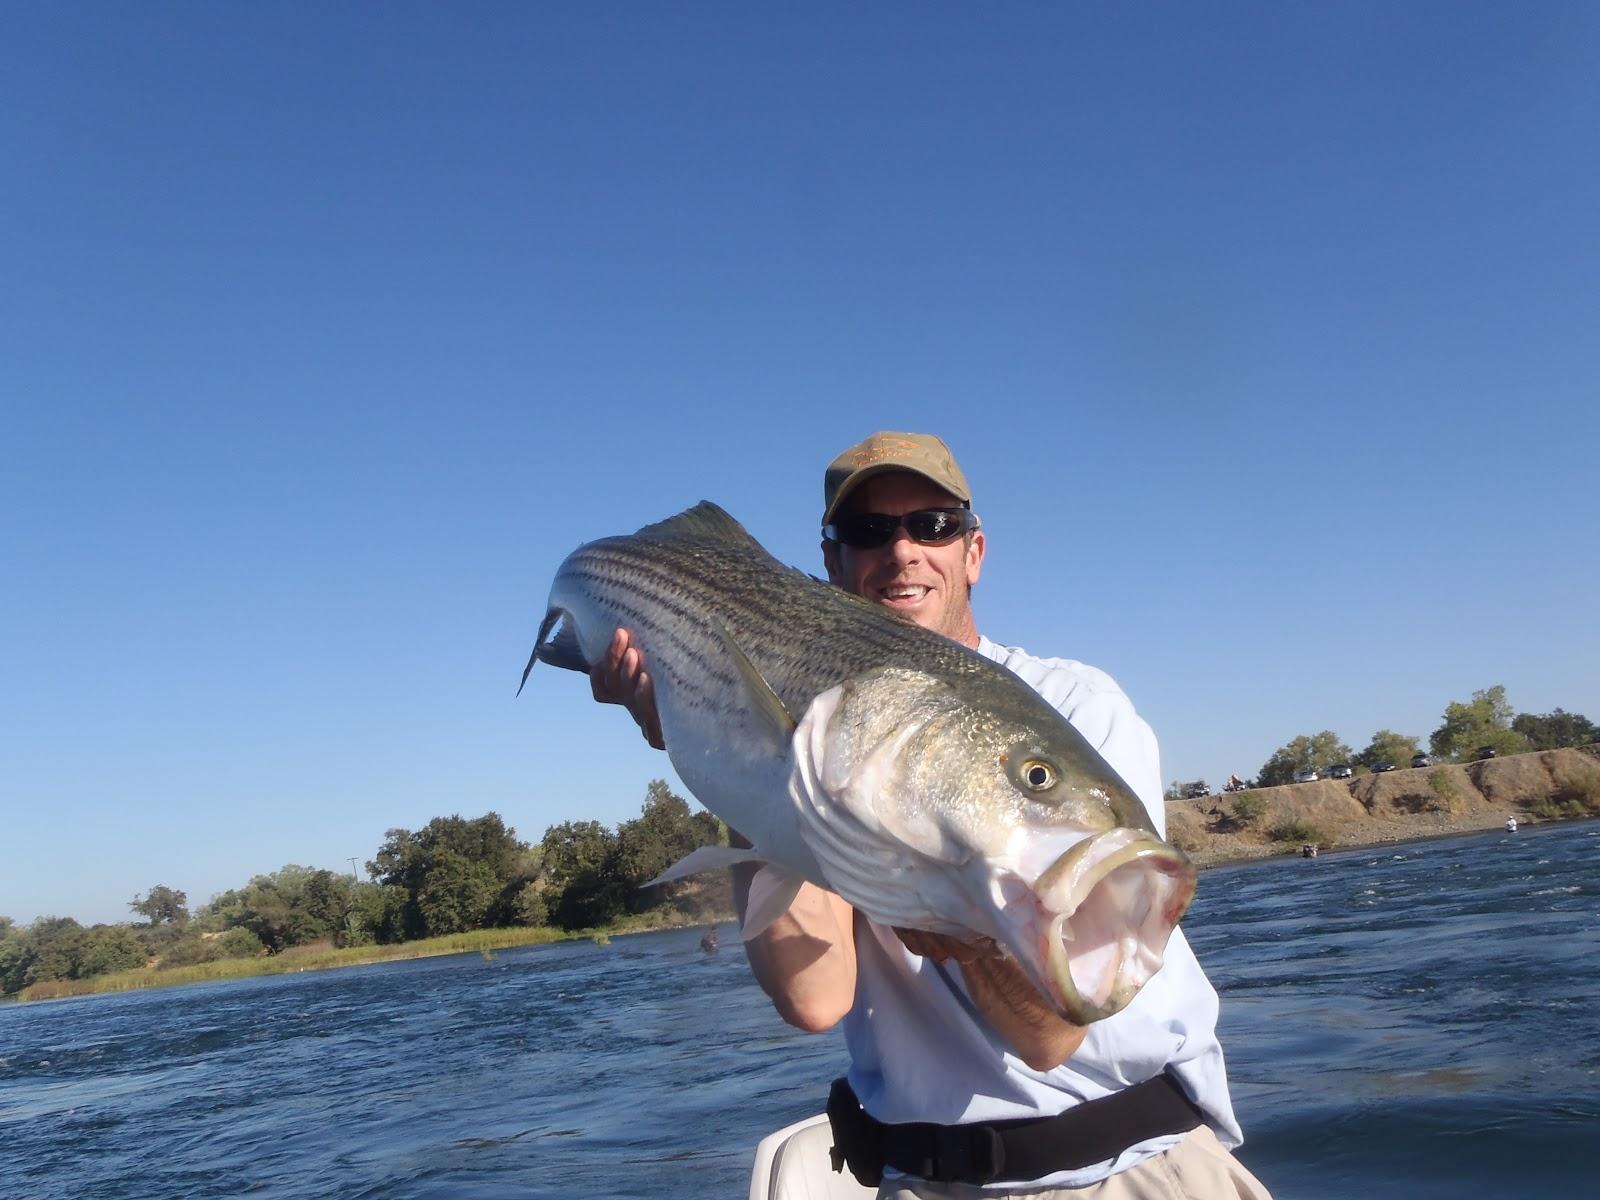 Irideus Fly Fishing Products Targeting California Trophy